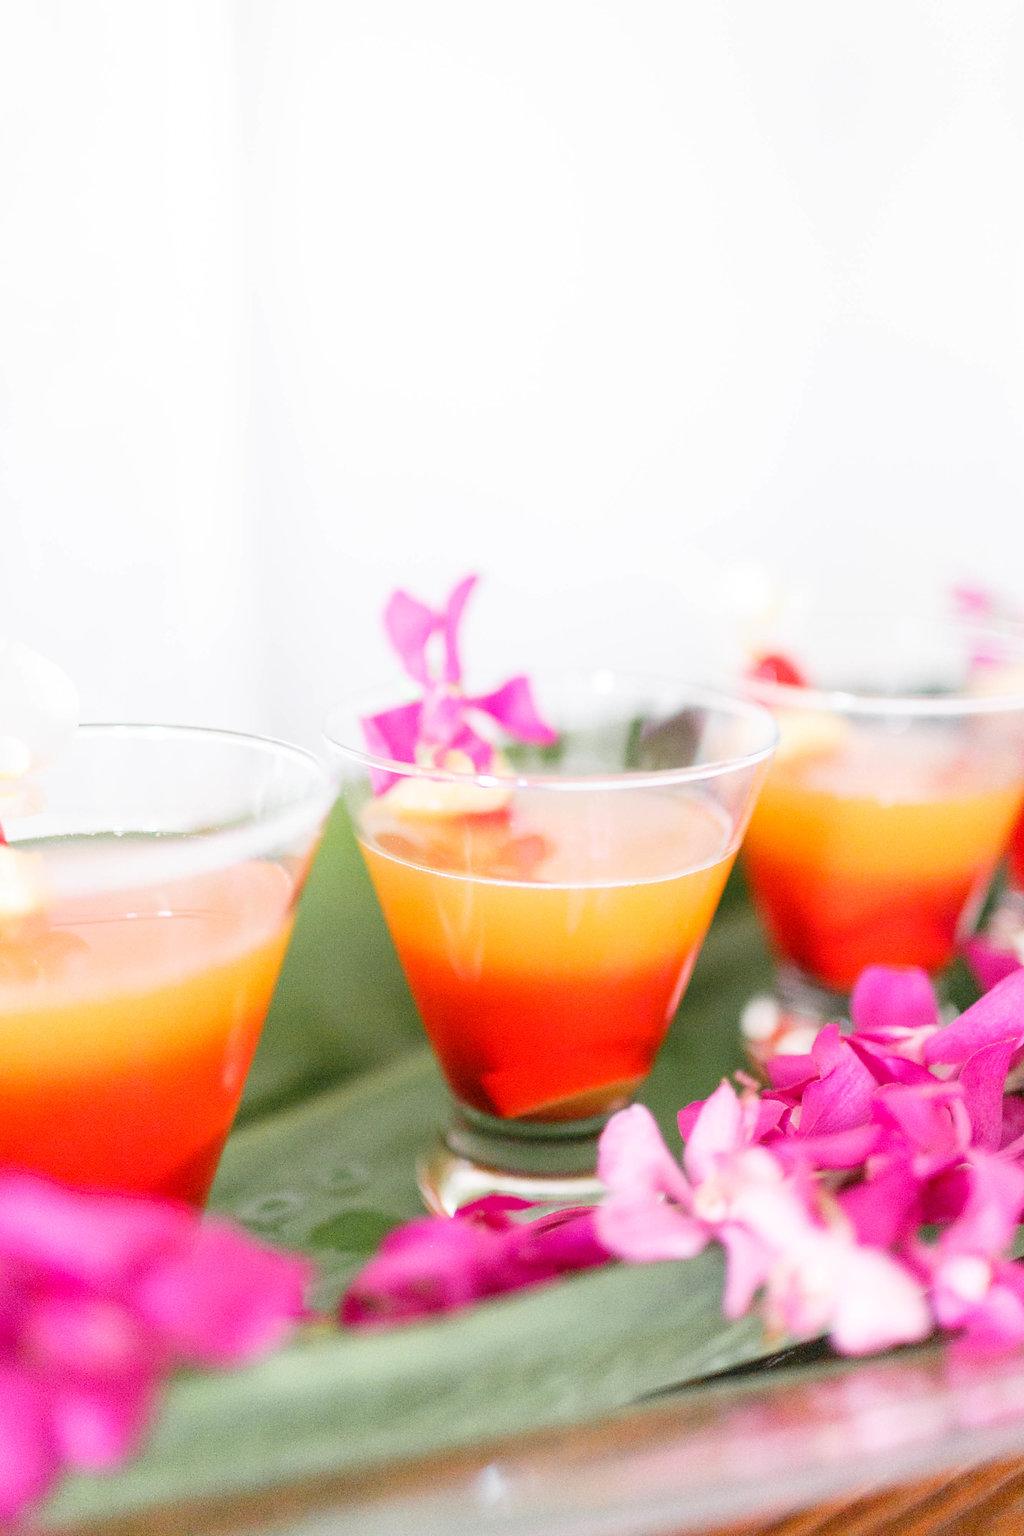 tropical wedding drinks - photo by Virginia Ashley Photography http://ruffledblog.com/modern-industrial-wedding-inspiration-with-tropical-vibes